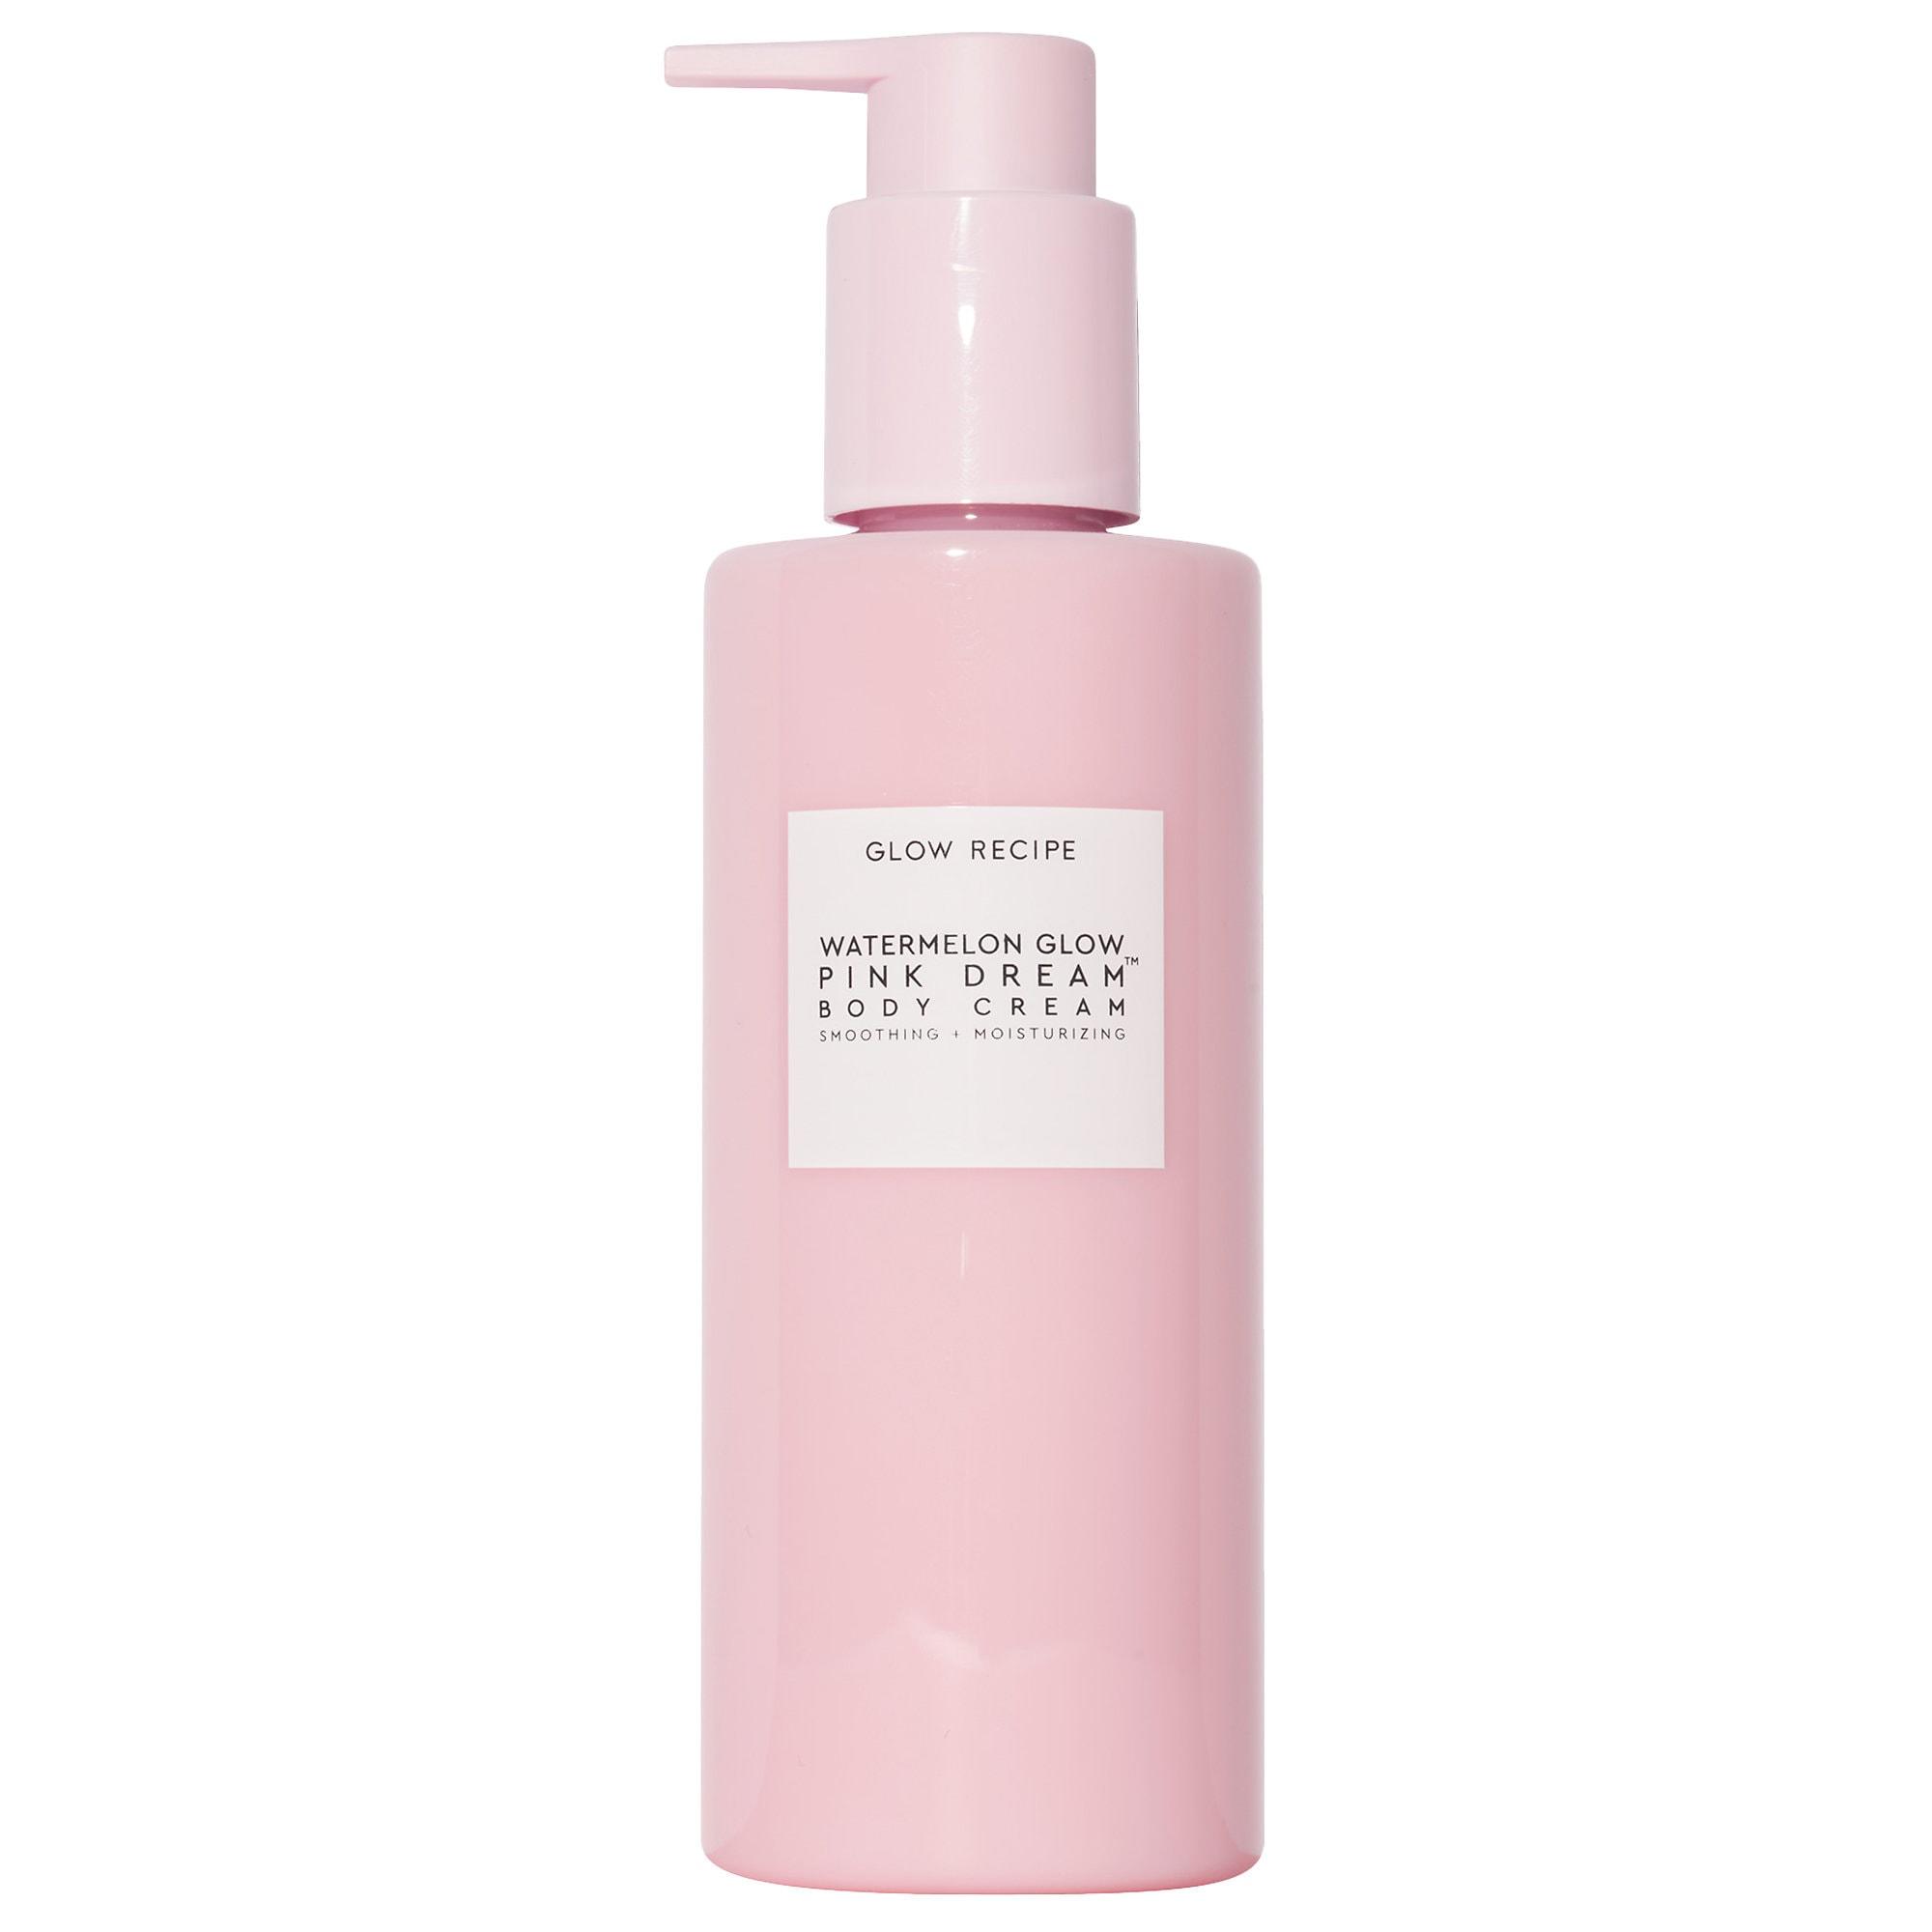 Glow Recipe - Watermelon Glow AHA Pink Dream Body Cream